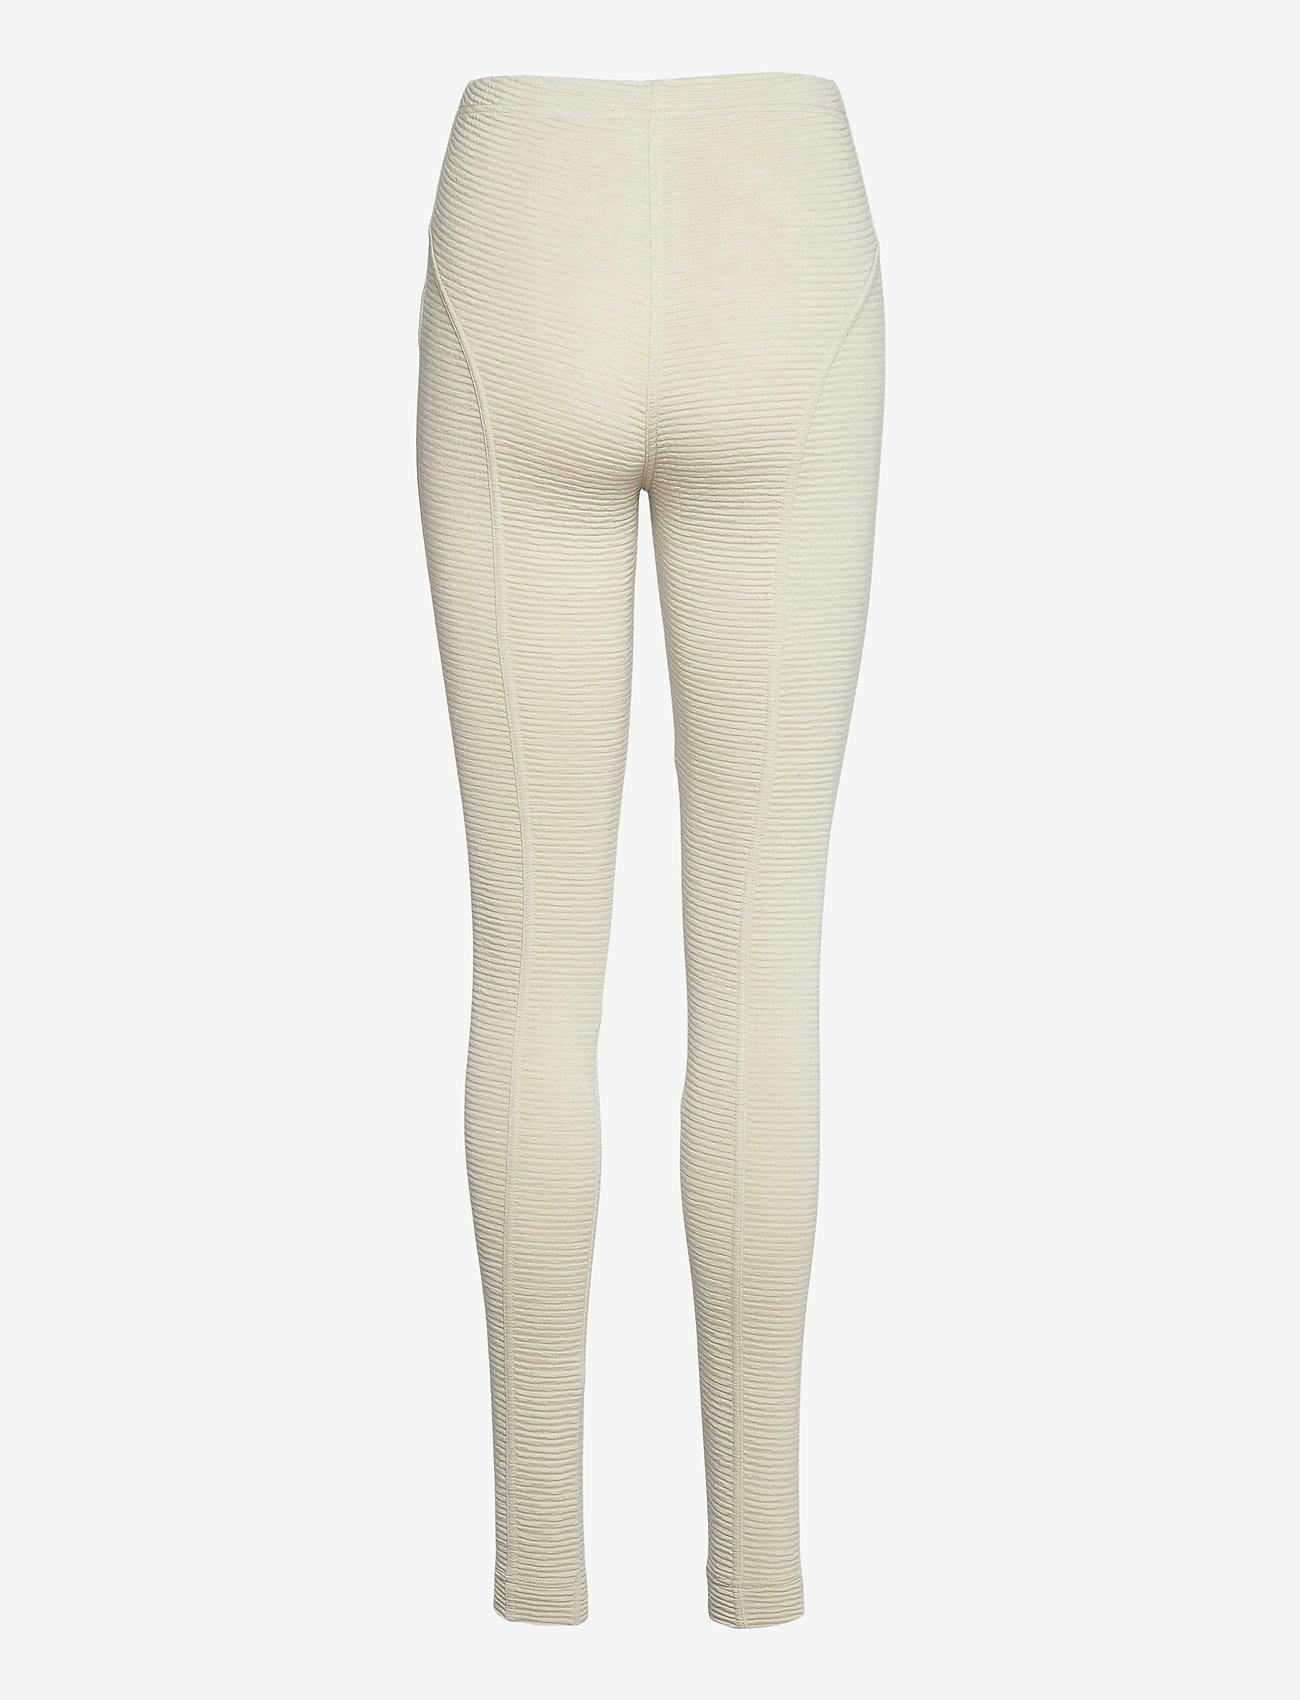 REMAIN Birger Christensen - Marisa Tights - leggings - pelican - 2